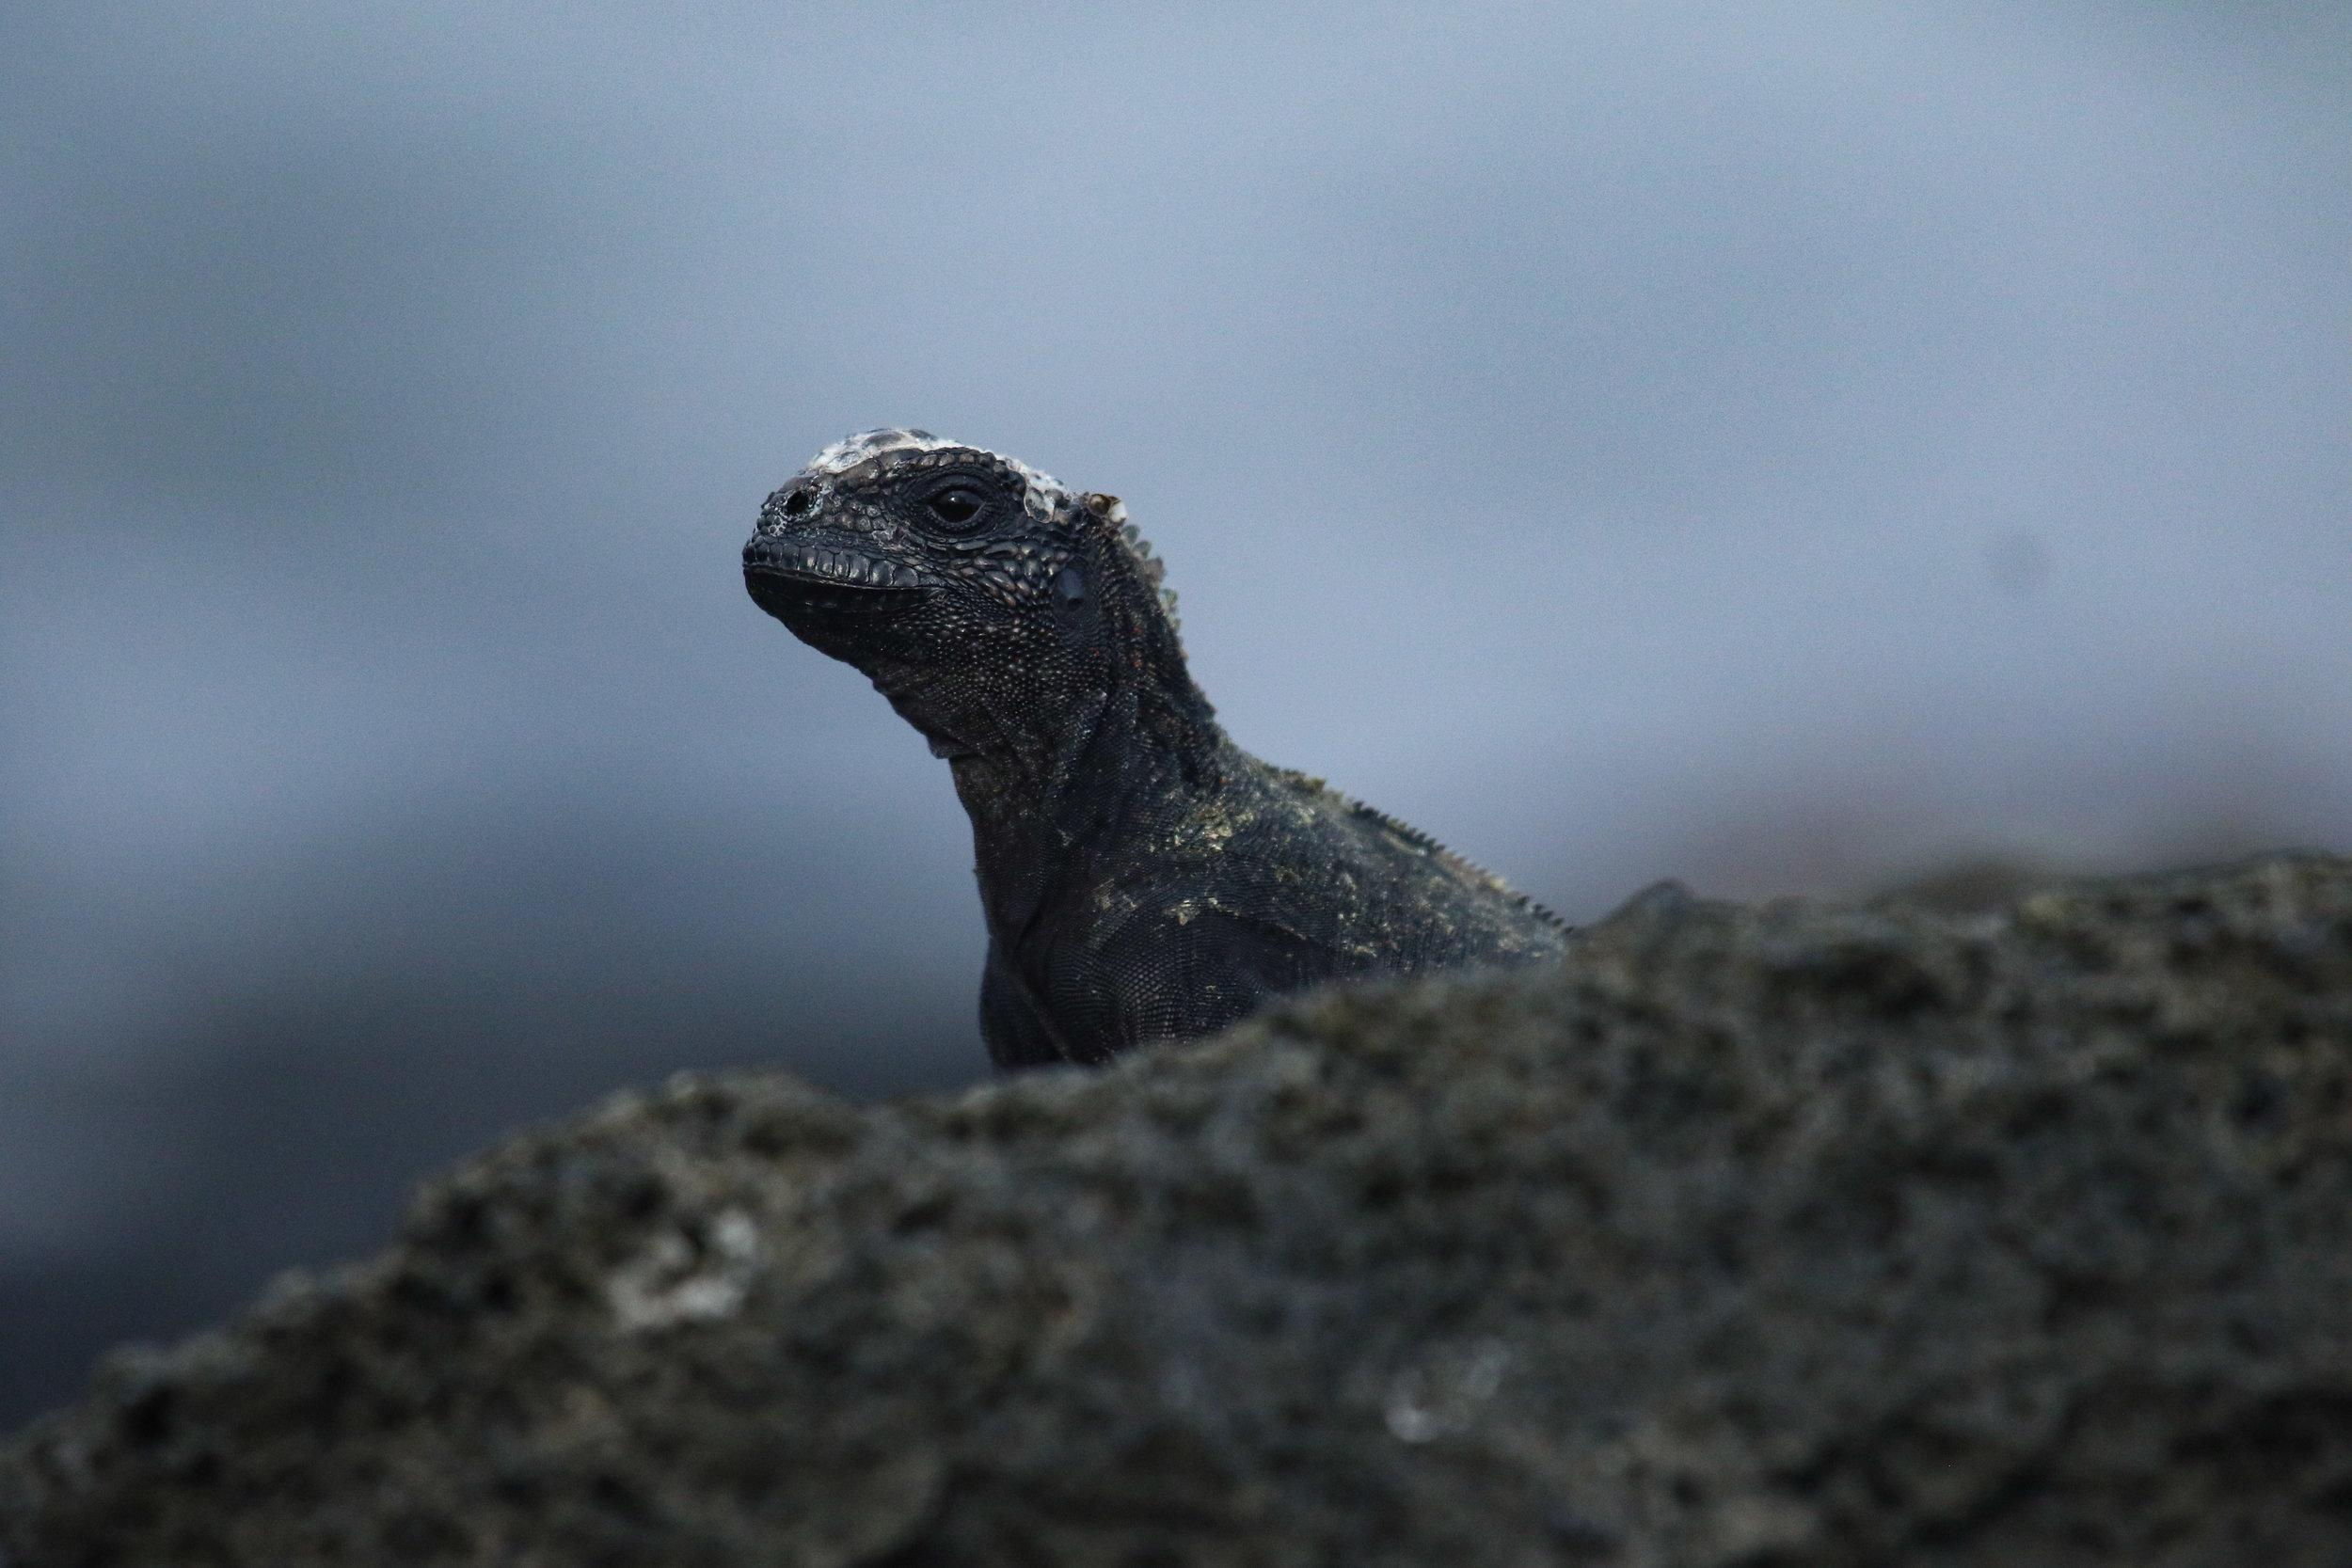 Young Marine Iguana Galapagos Islands Ecuador by Millie Kerr -1.jpg